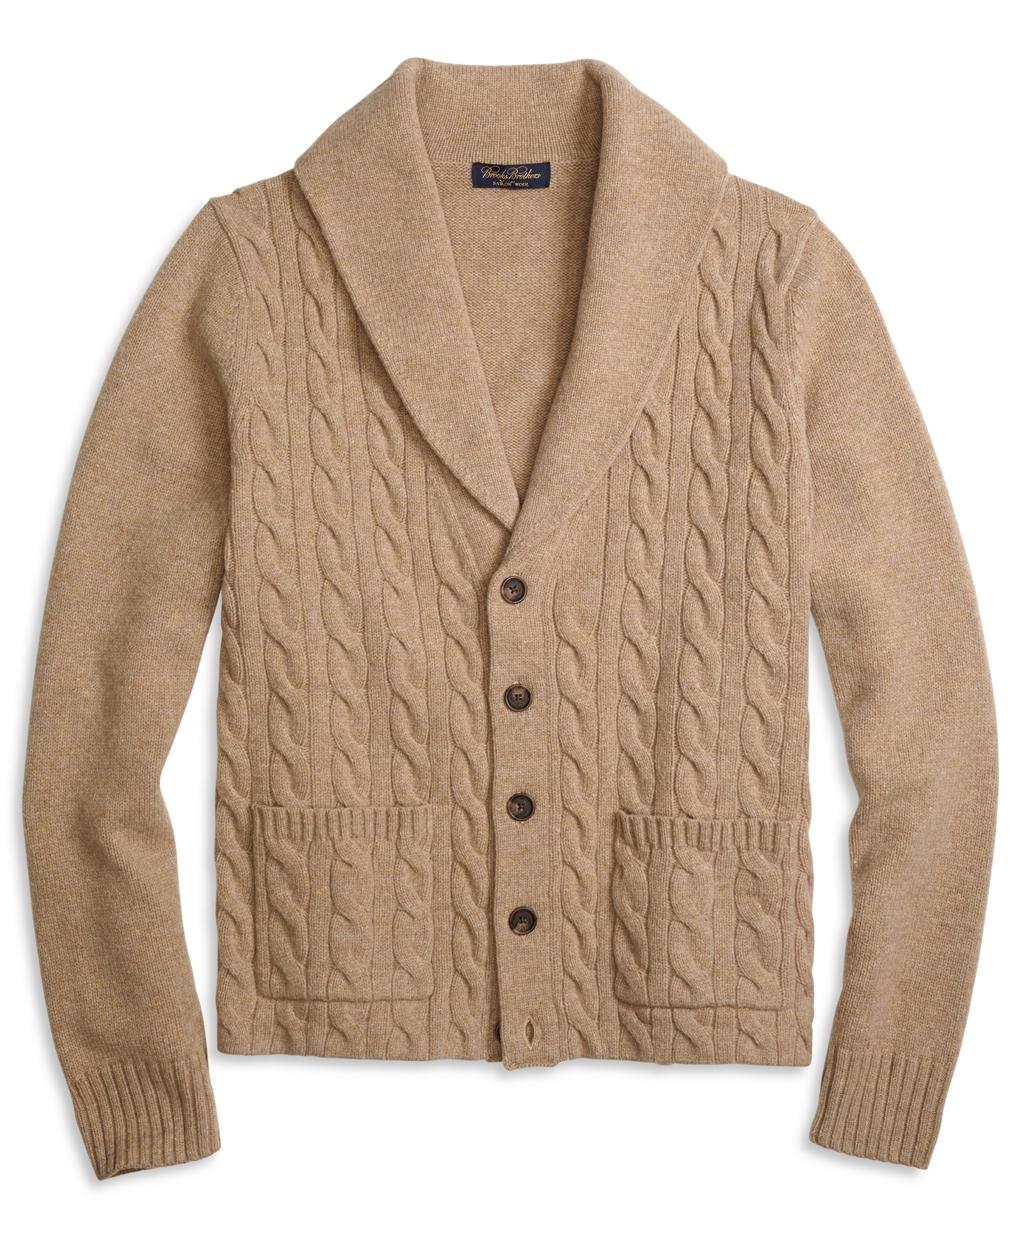 Men's Saxxon Wool Shawl Collar Cable Knit Cardigan | Brooks Brothers